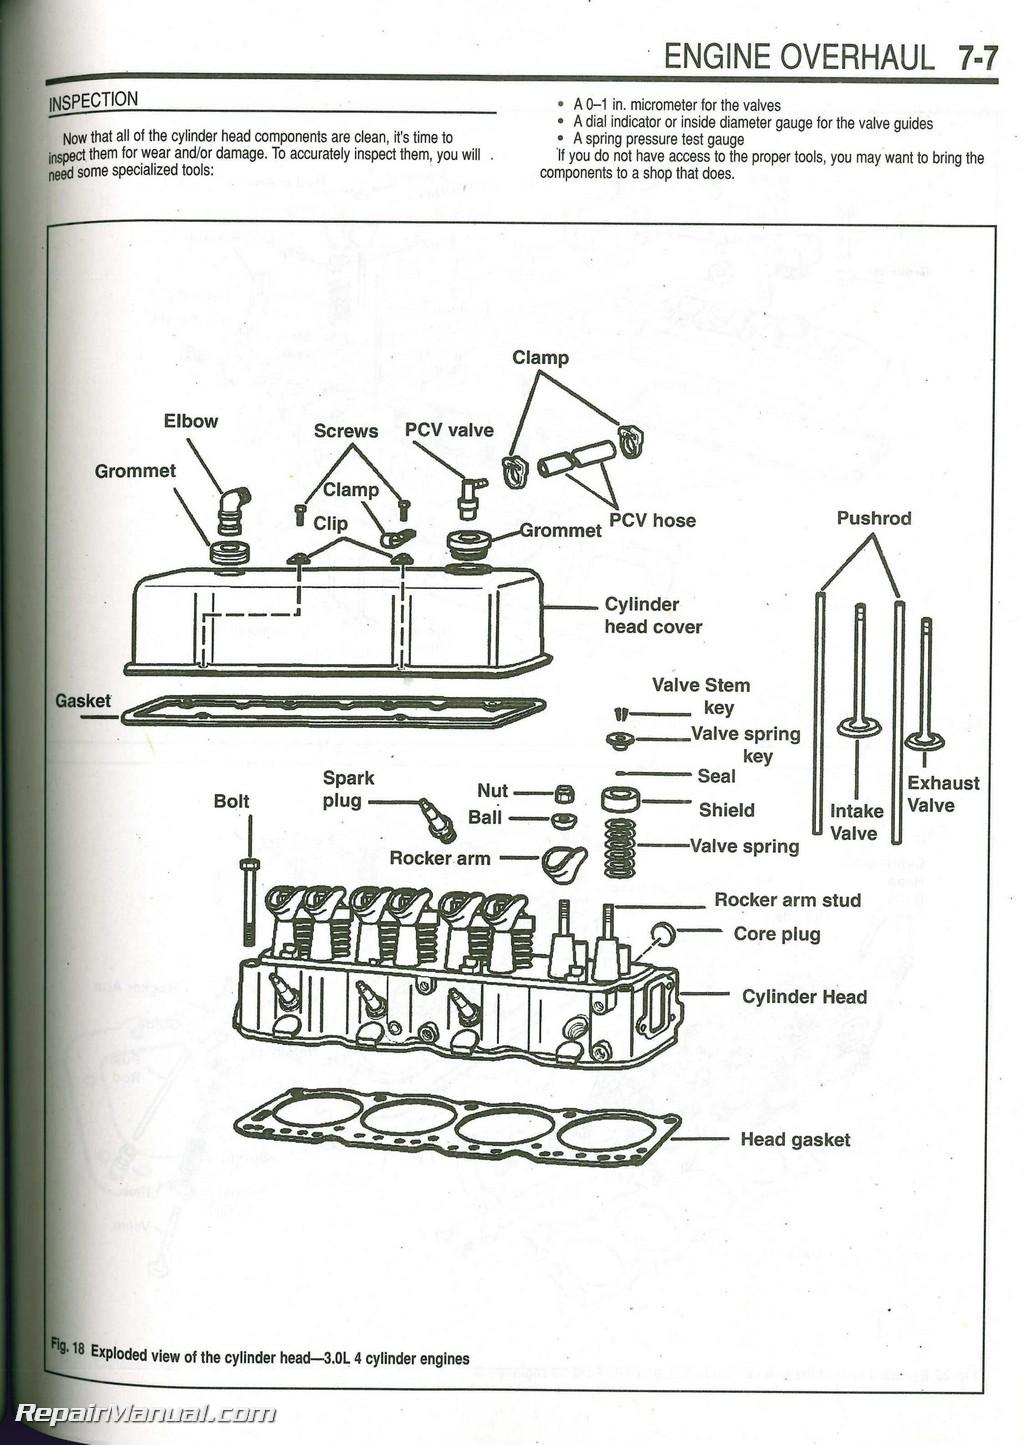 1998 omc 4 3 v6 wiring diagram